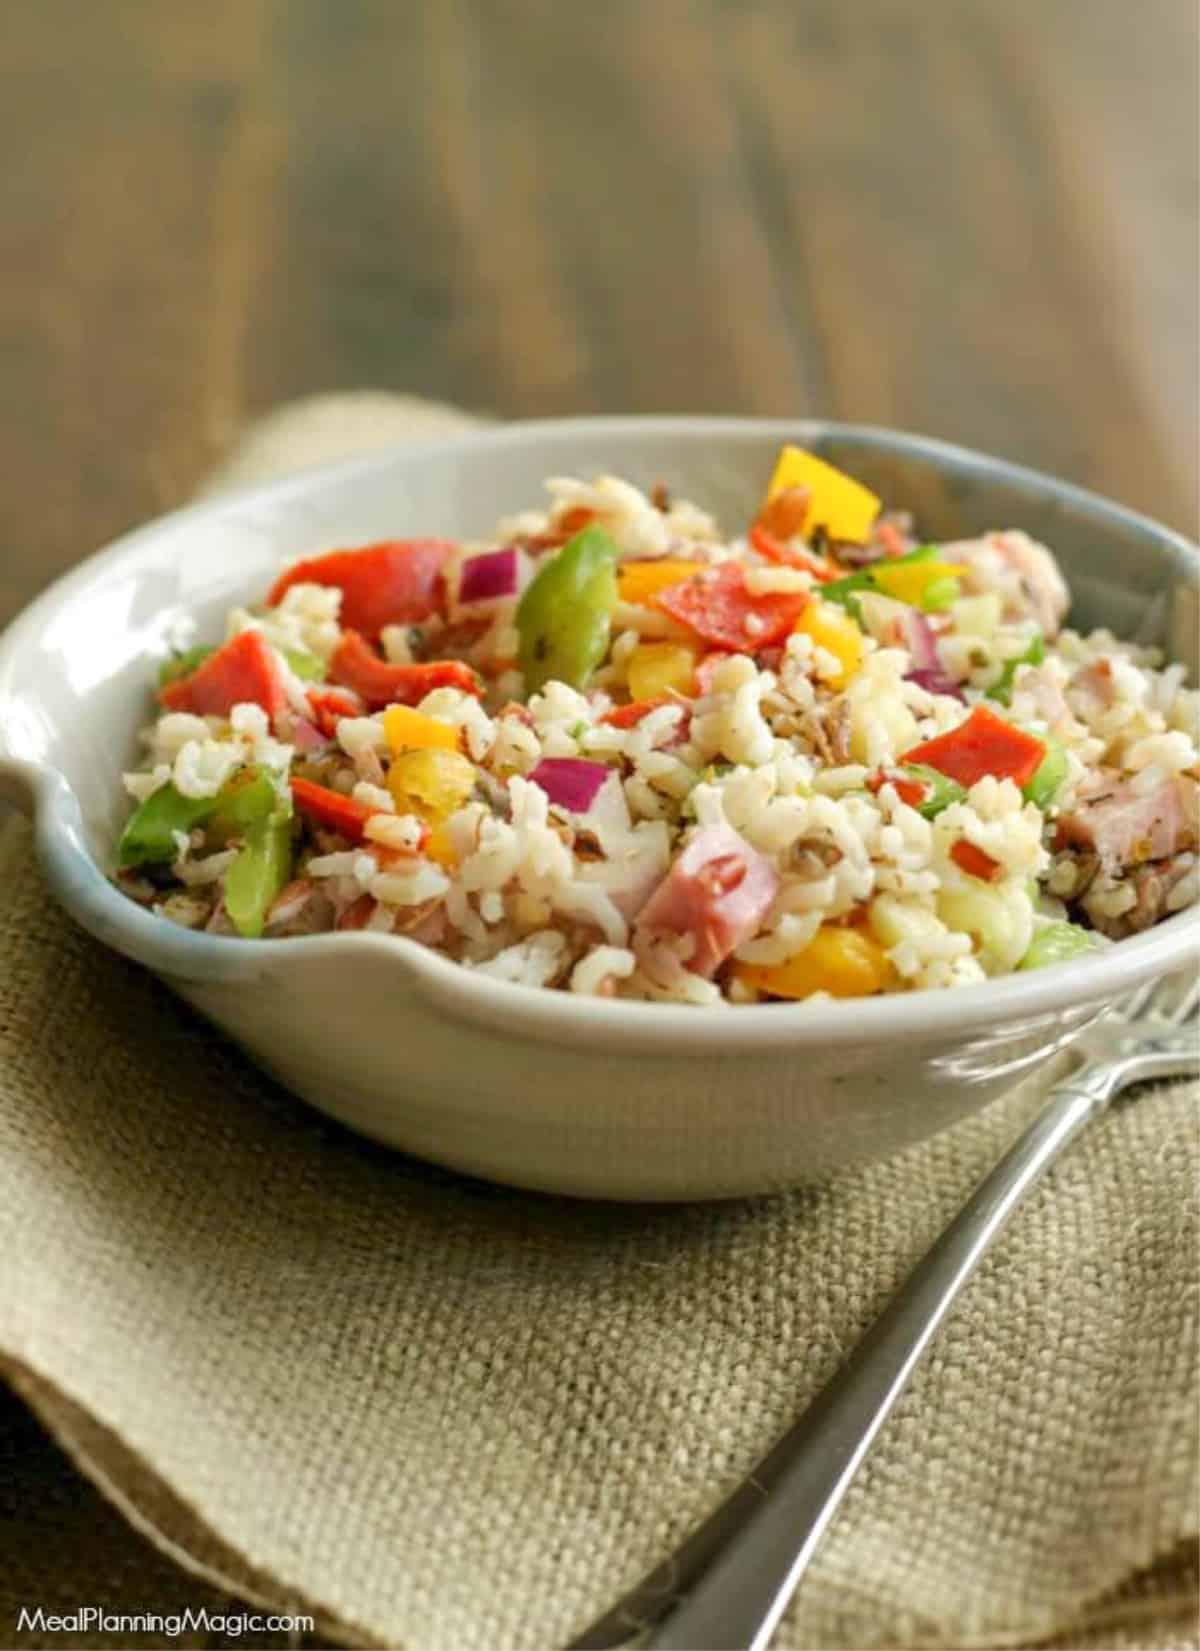 Italian Vegetable Wild Rice Salad in a pottery bowl on burlap napkin.